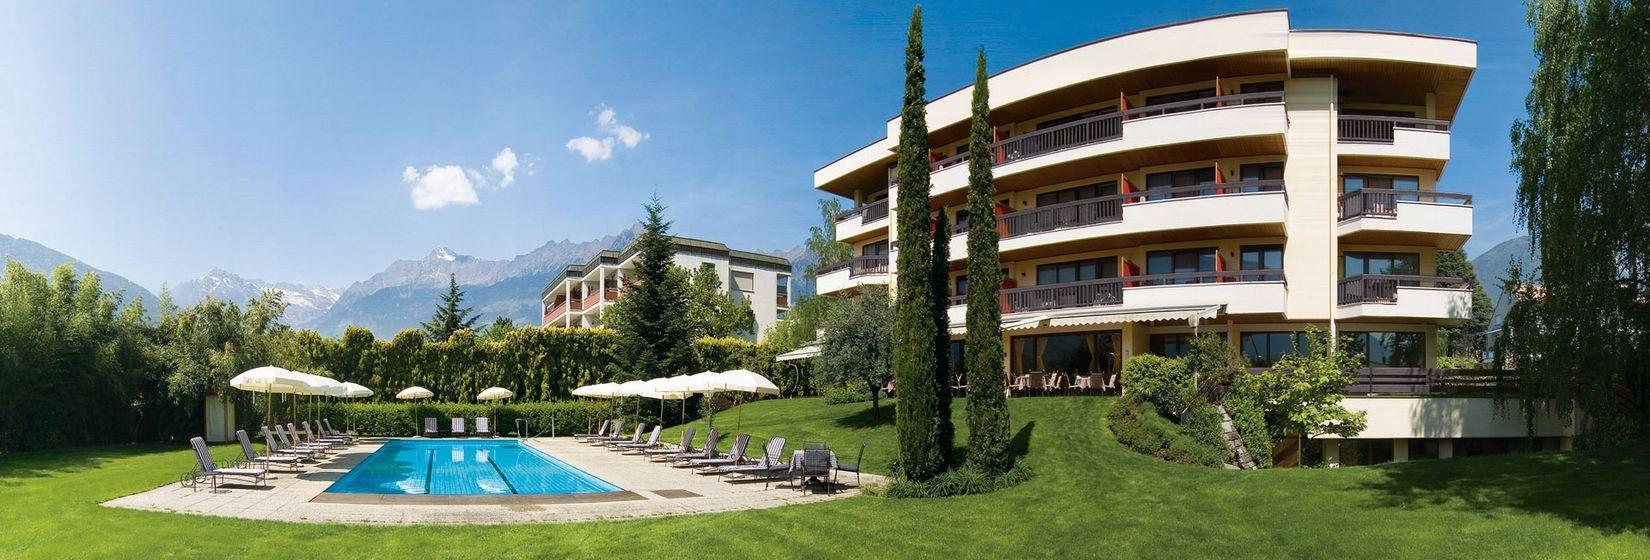 Hotel Meran 4 Sterne | Hotel Pollinger **** Südtirol